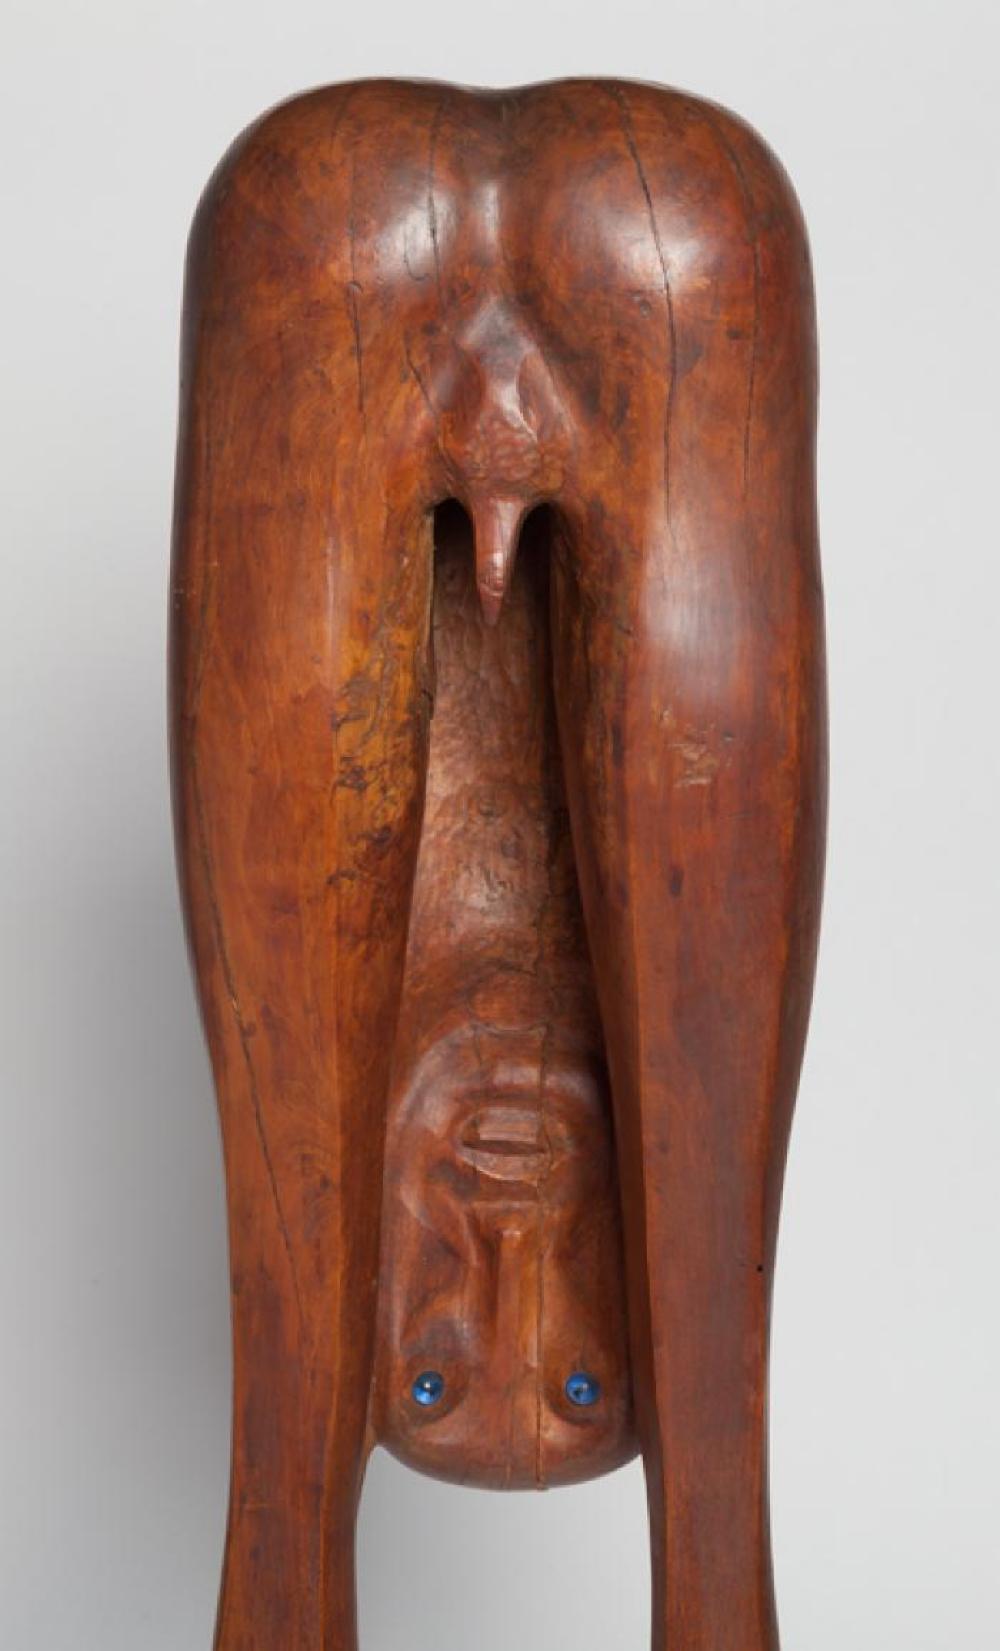 Boy Looking through Legs, image 6